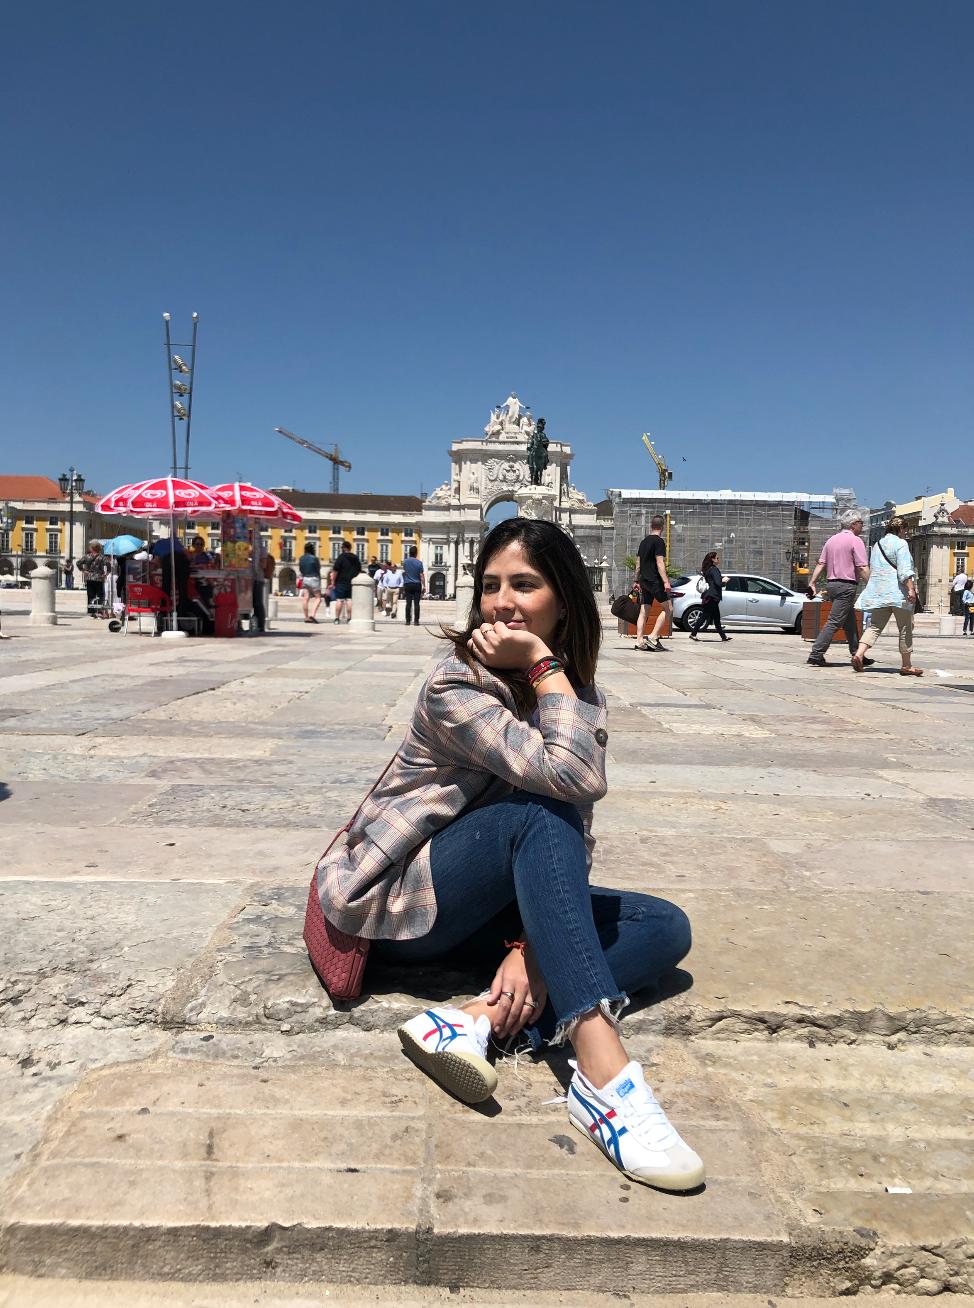 sparks joy - Sparks Joy: Traveling Like Marie Kondo